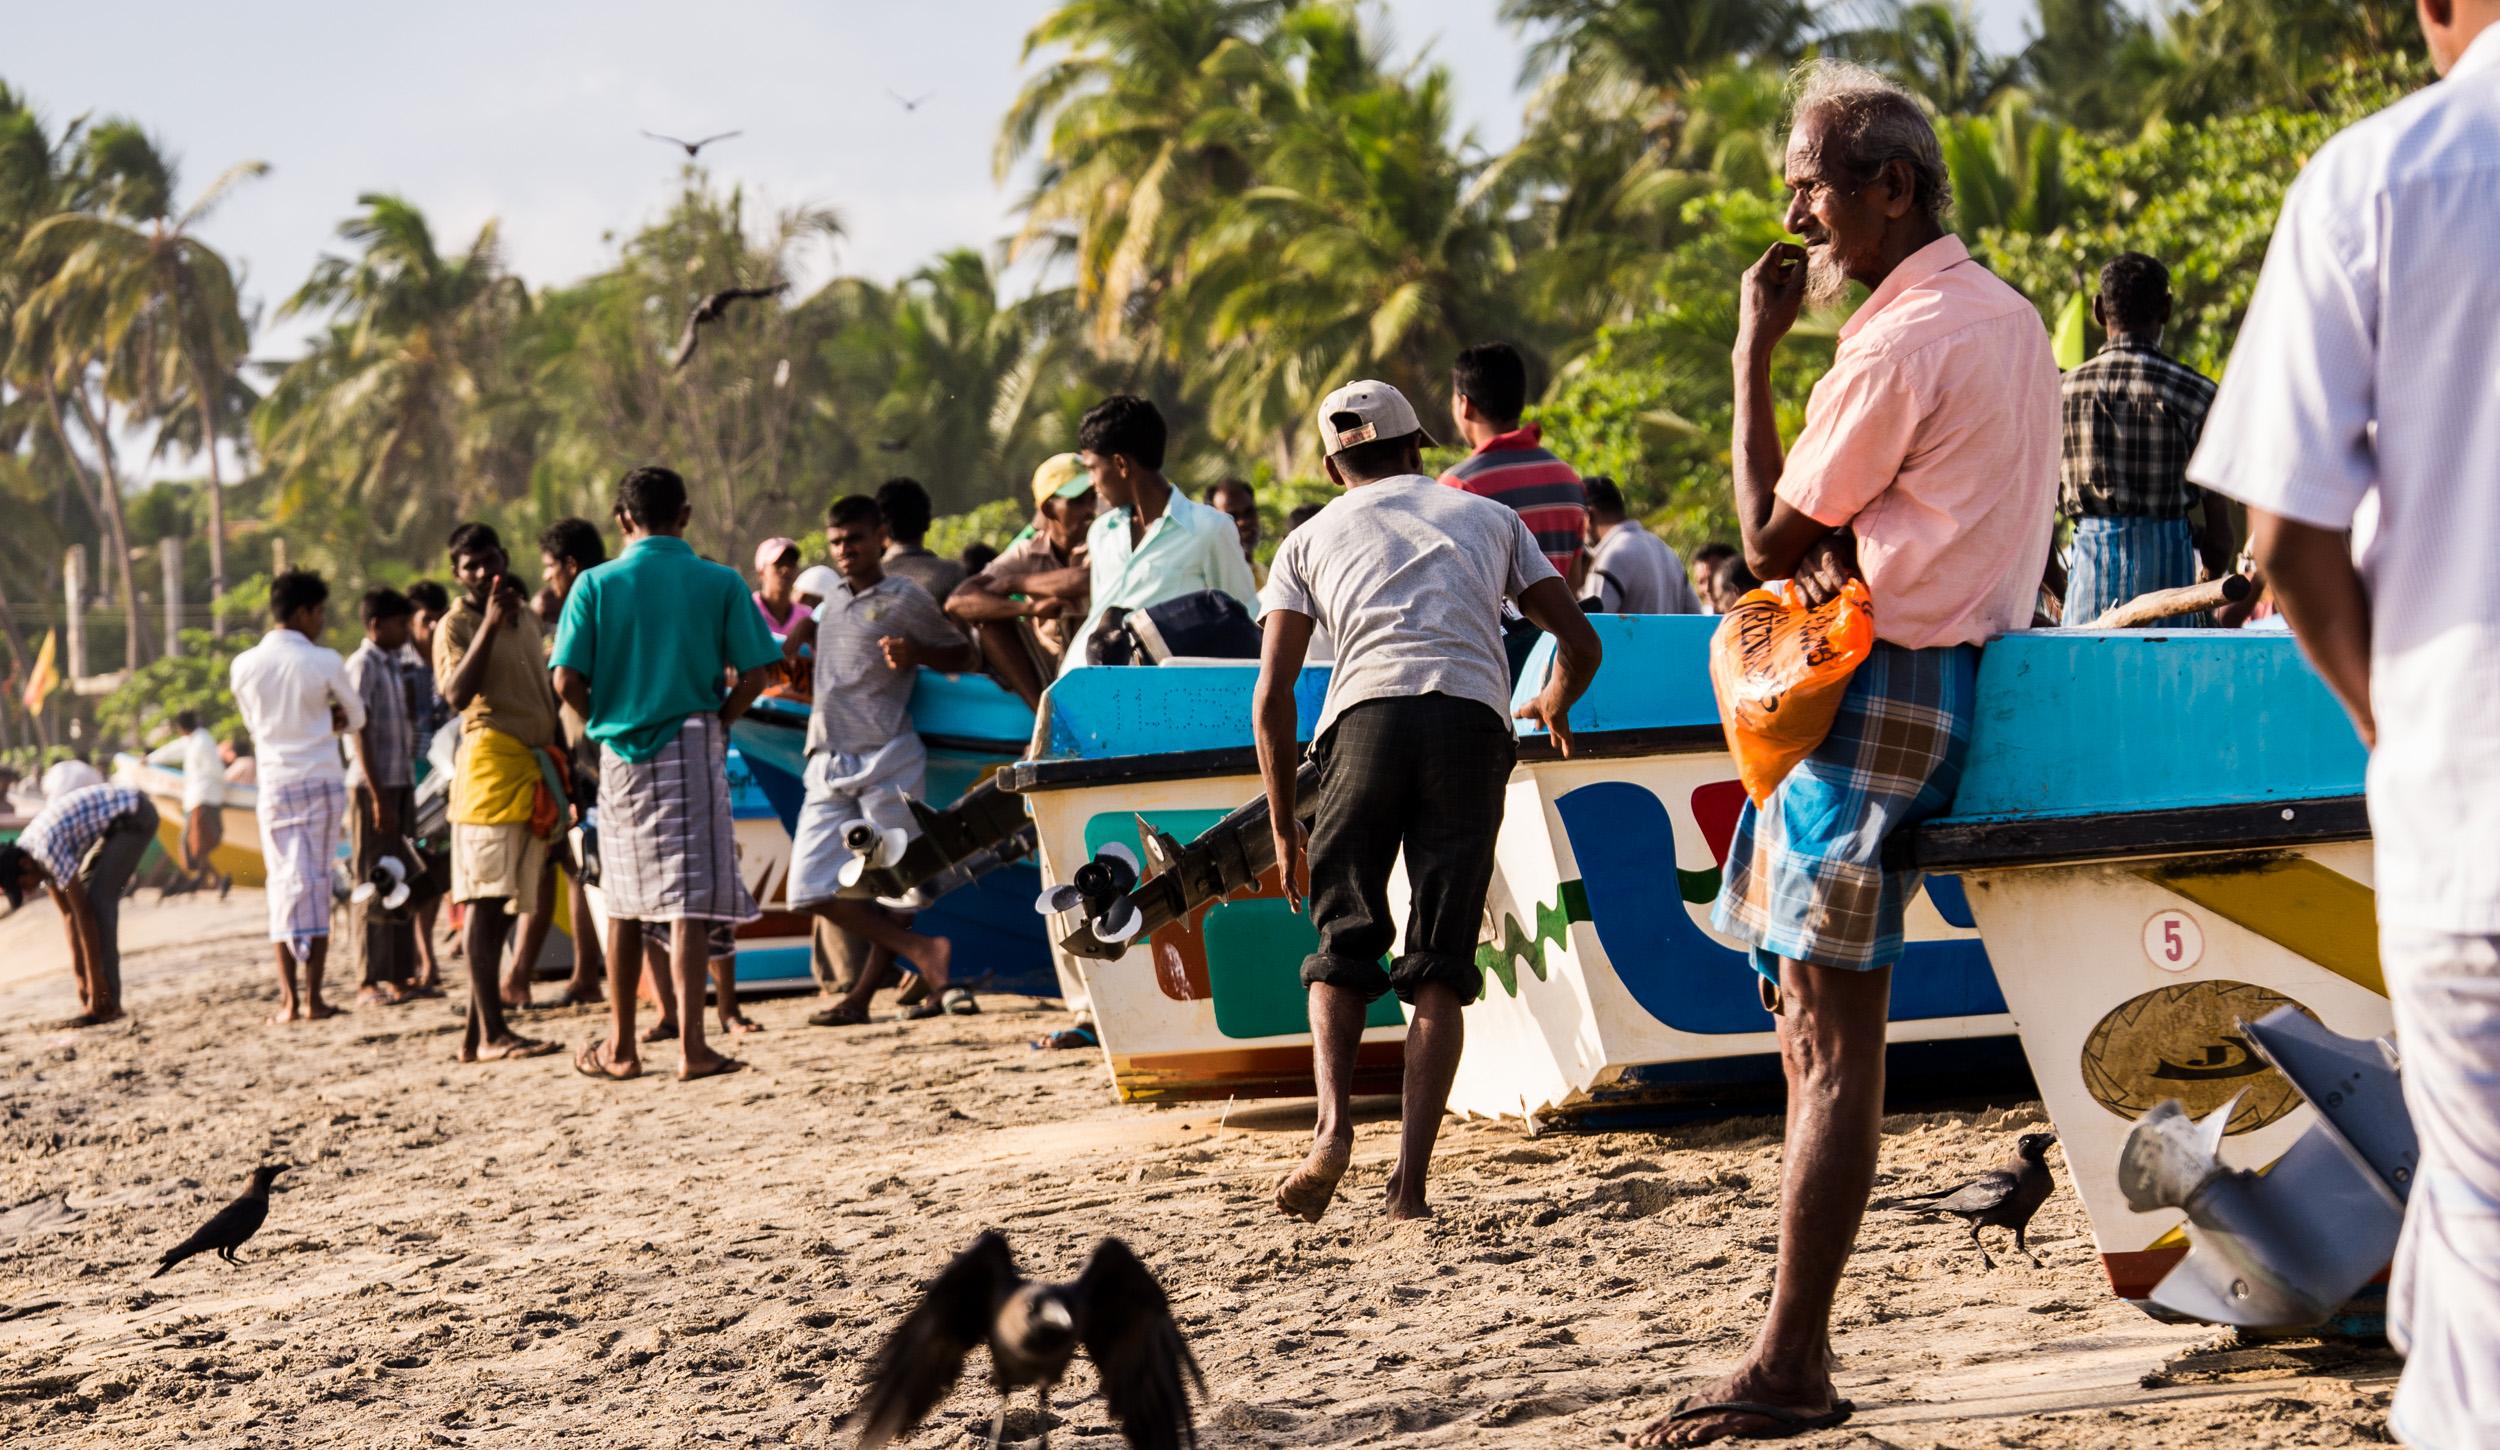 _1 Arugam bay Fisherman Conemplating .jpg